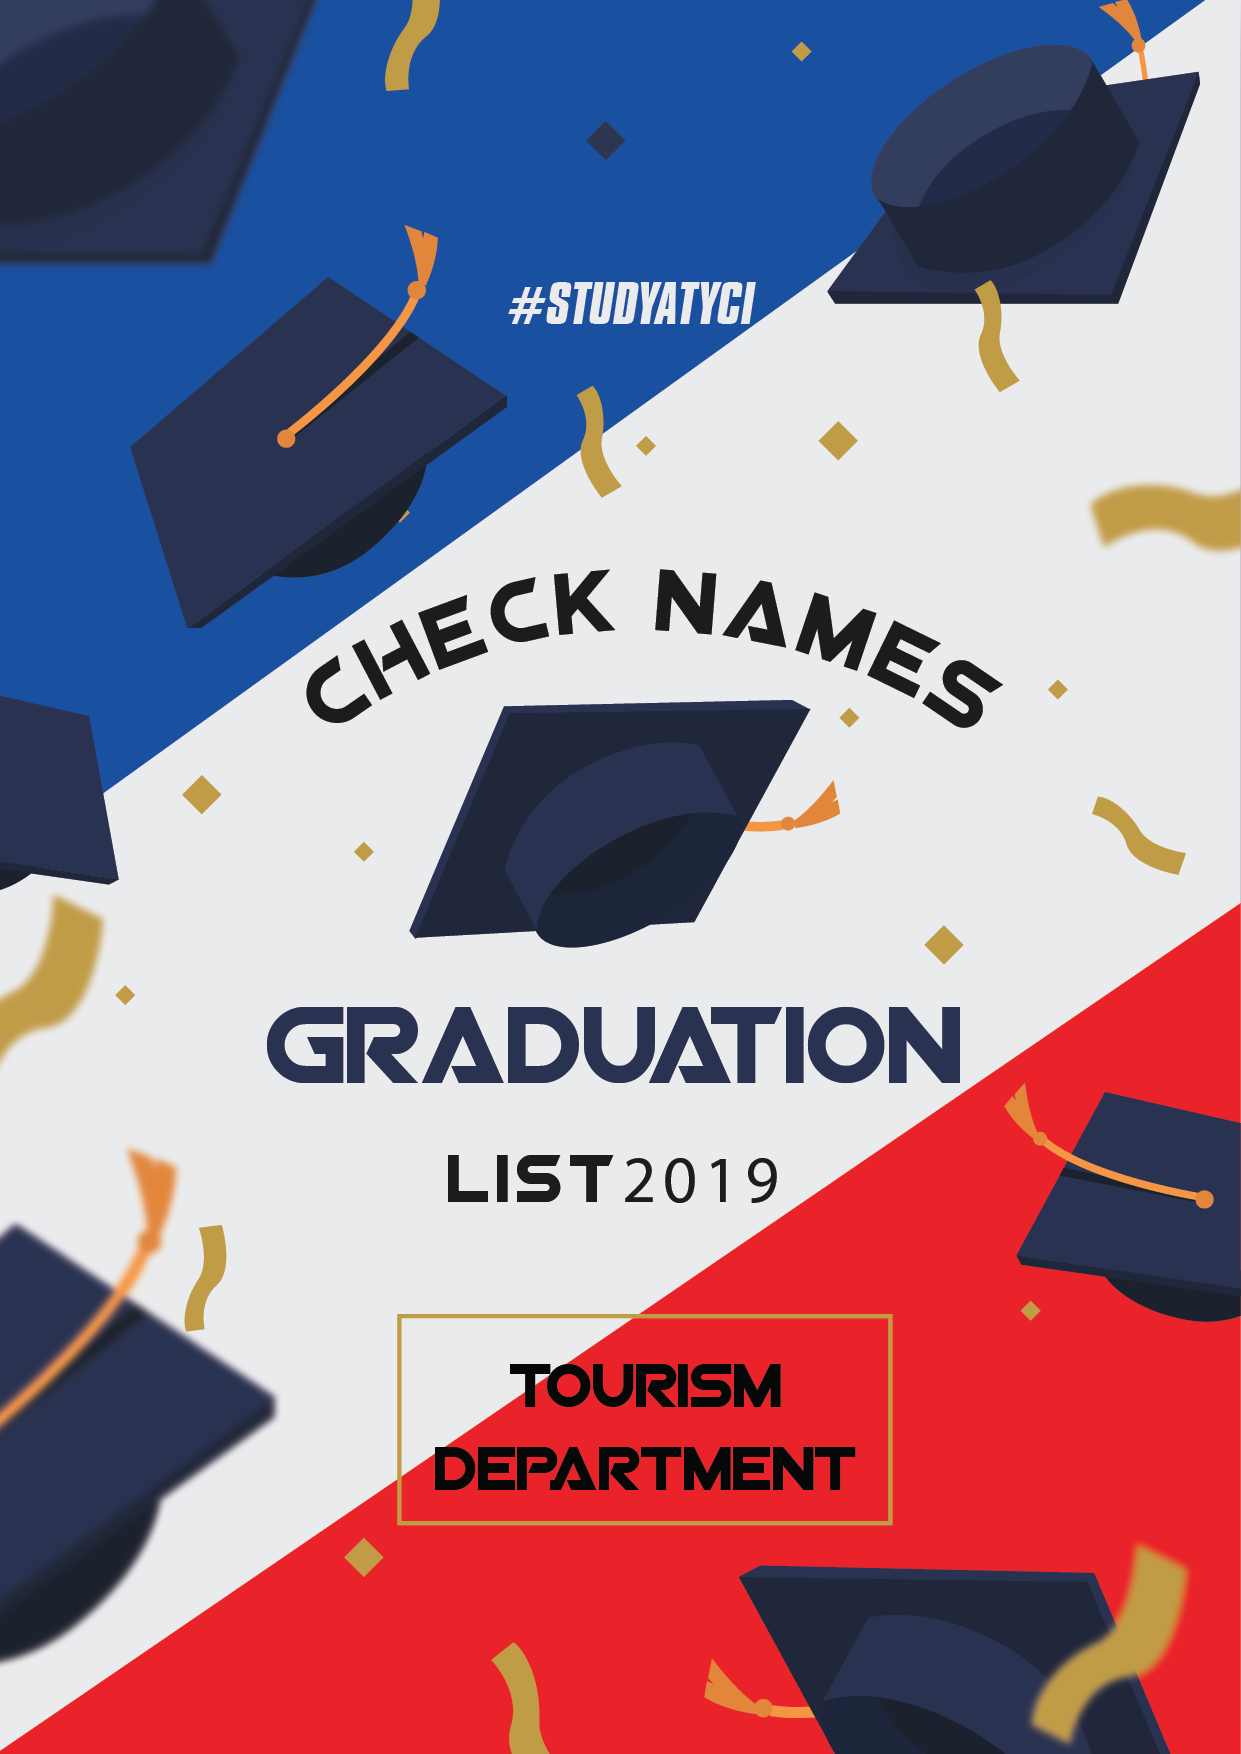 TOURISM – GRADUATION LIST